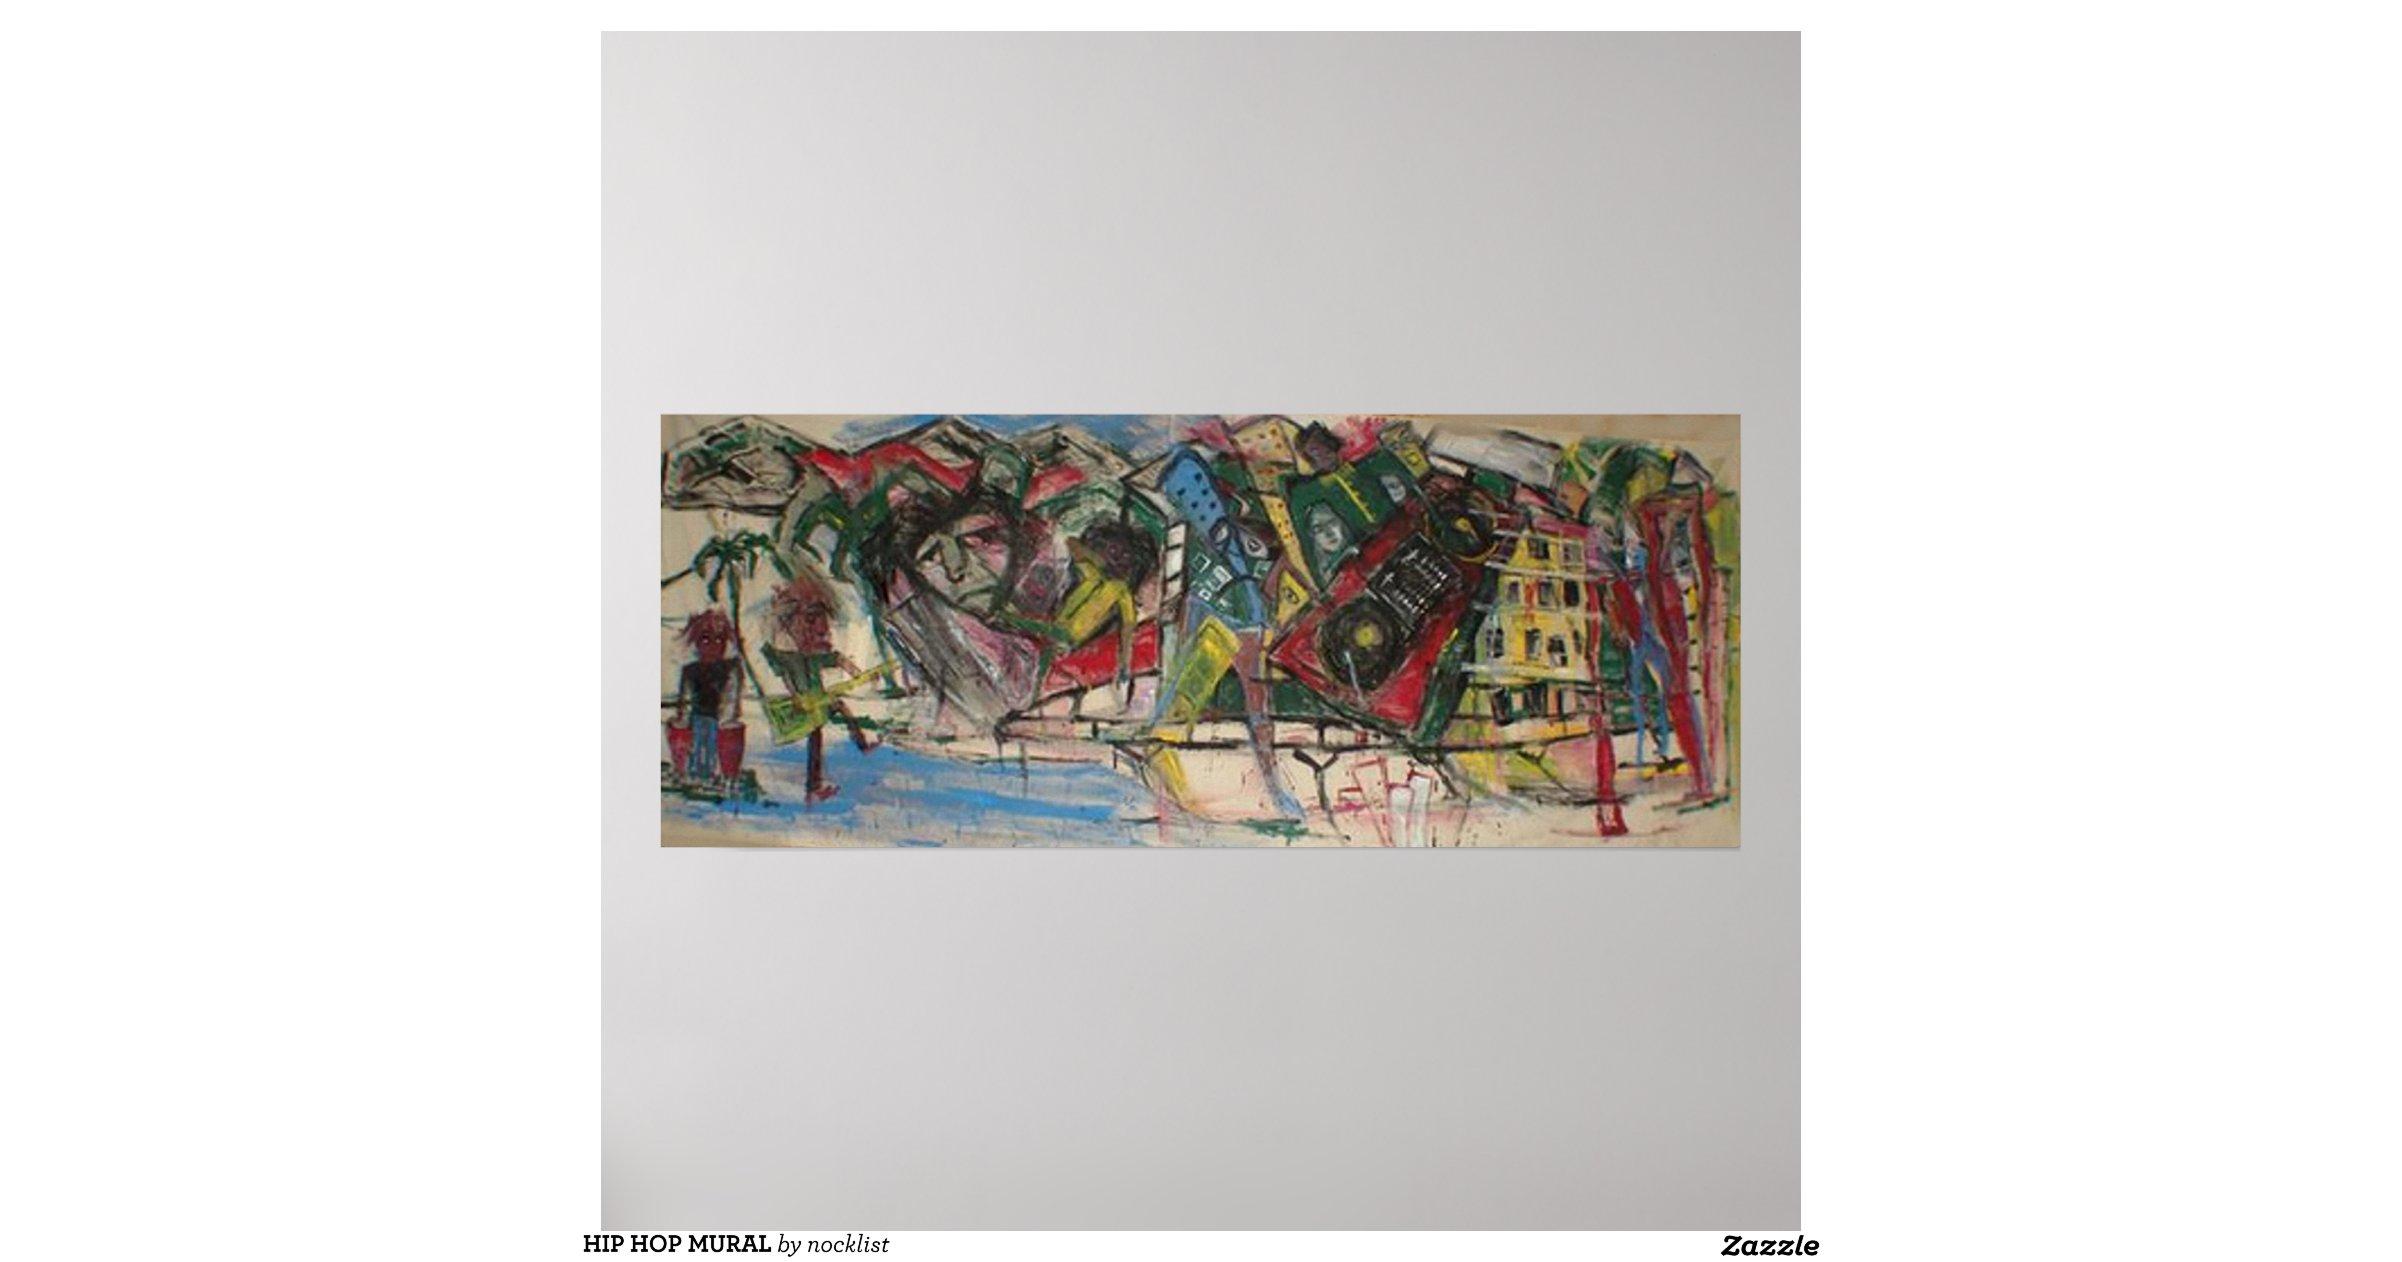 Hip hop mural poster r4a4a9c0fa5114409b1313d477a5a2b7f for Poster mural 4 murs